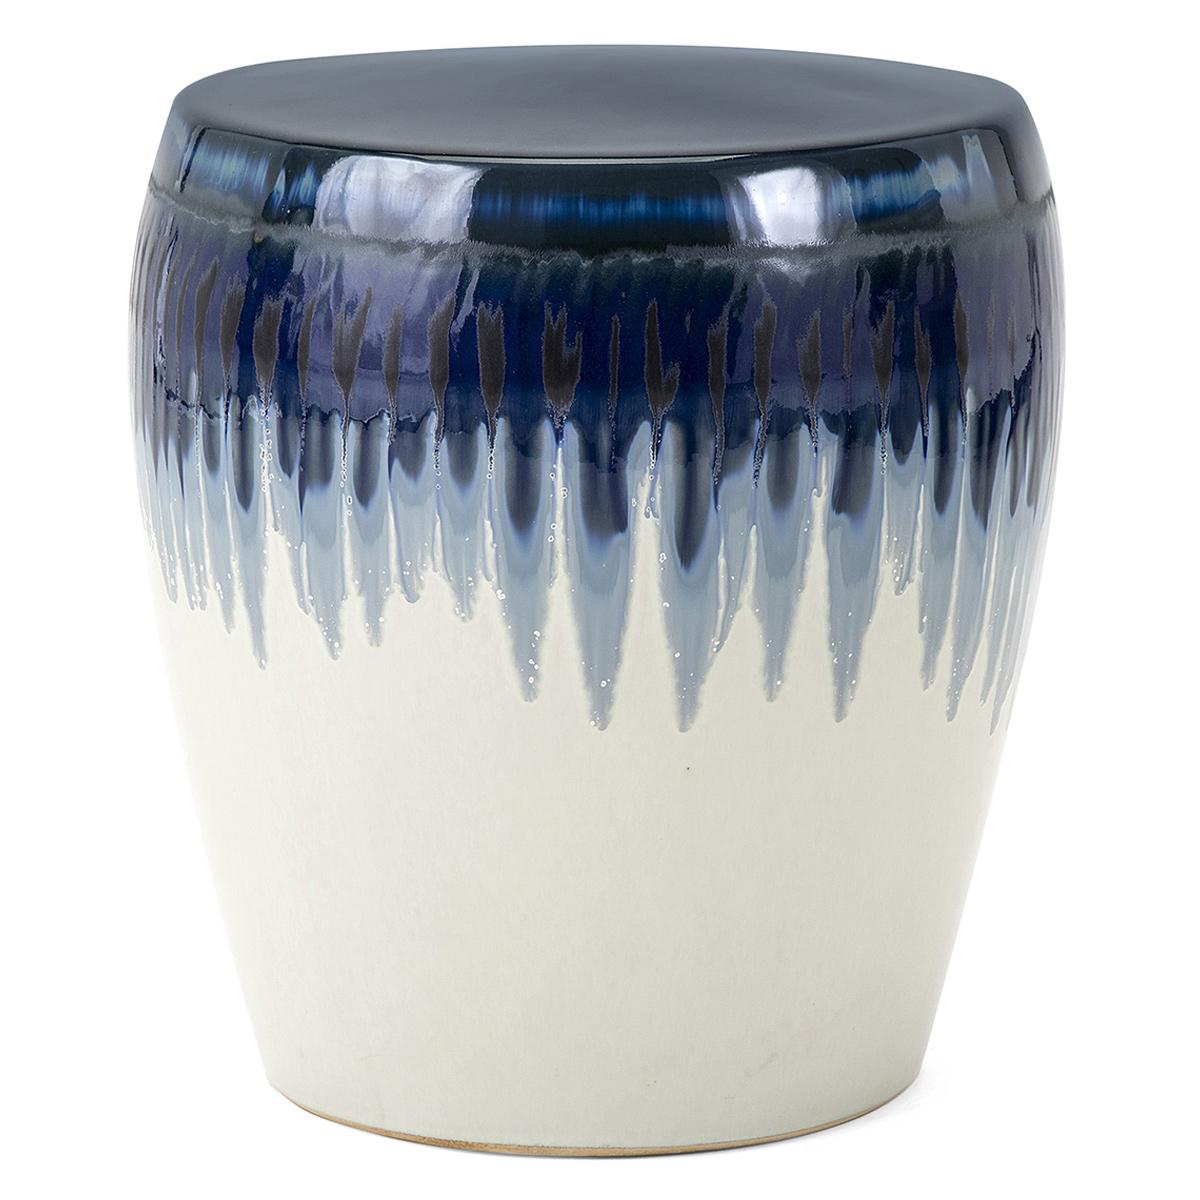 Williar Cherry Blossom Ceramic Garden Stools Regarding Popular Azul Ceramic Garden Stool (View 21 of 30)